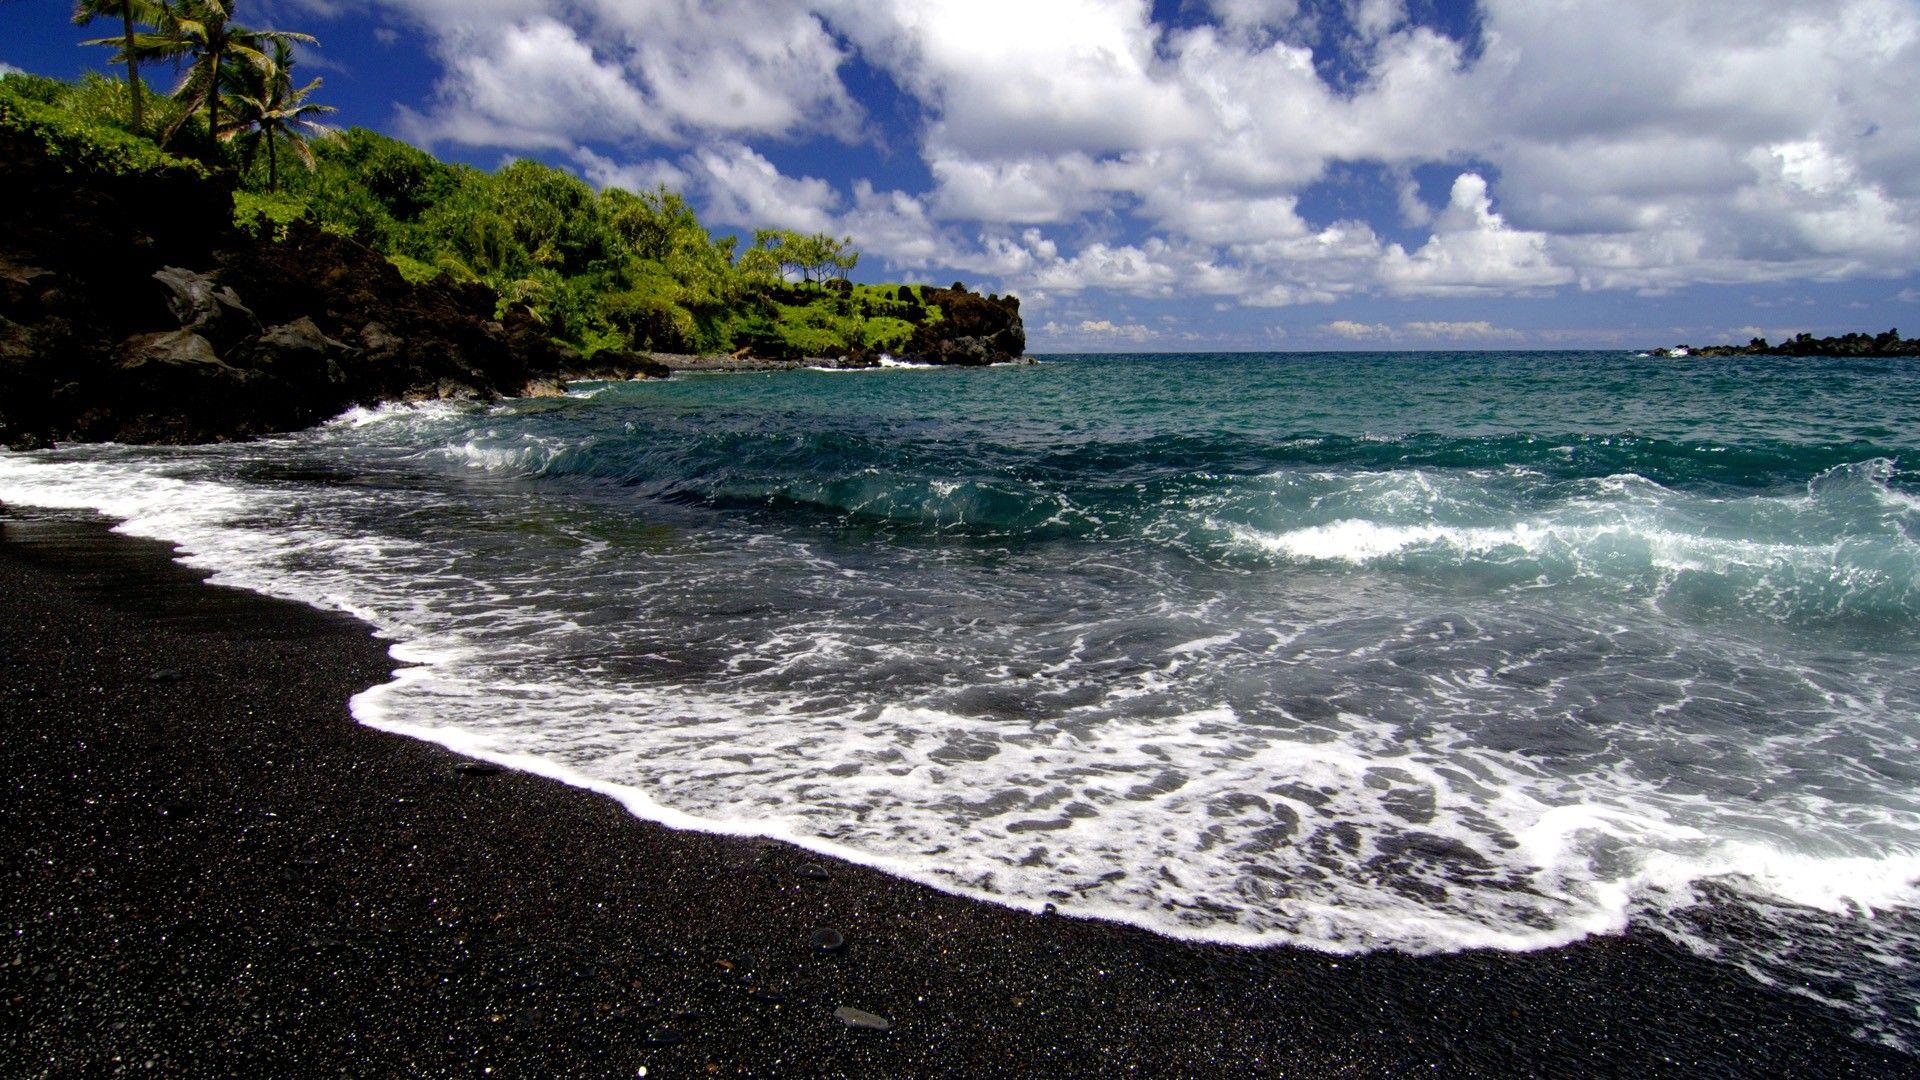 Beach Waves Hawaii Maui Black Sand 1920x1080 Wallpaper With